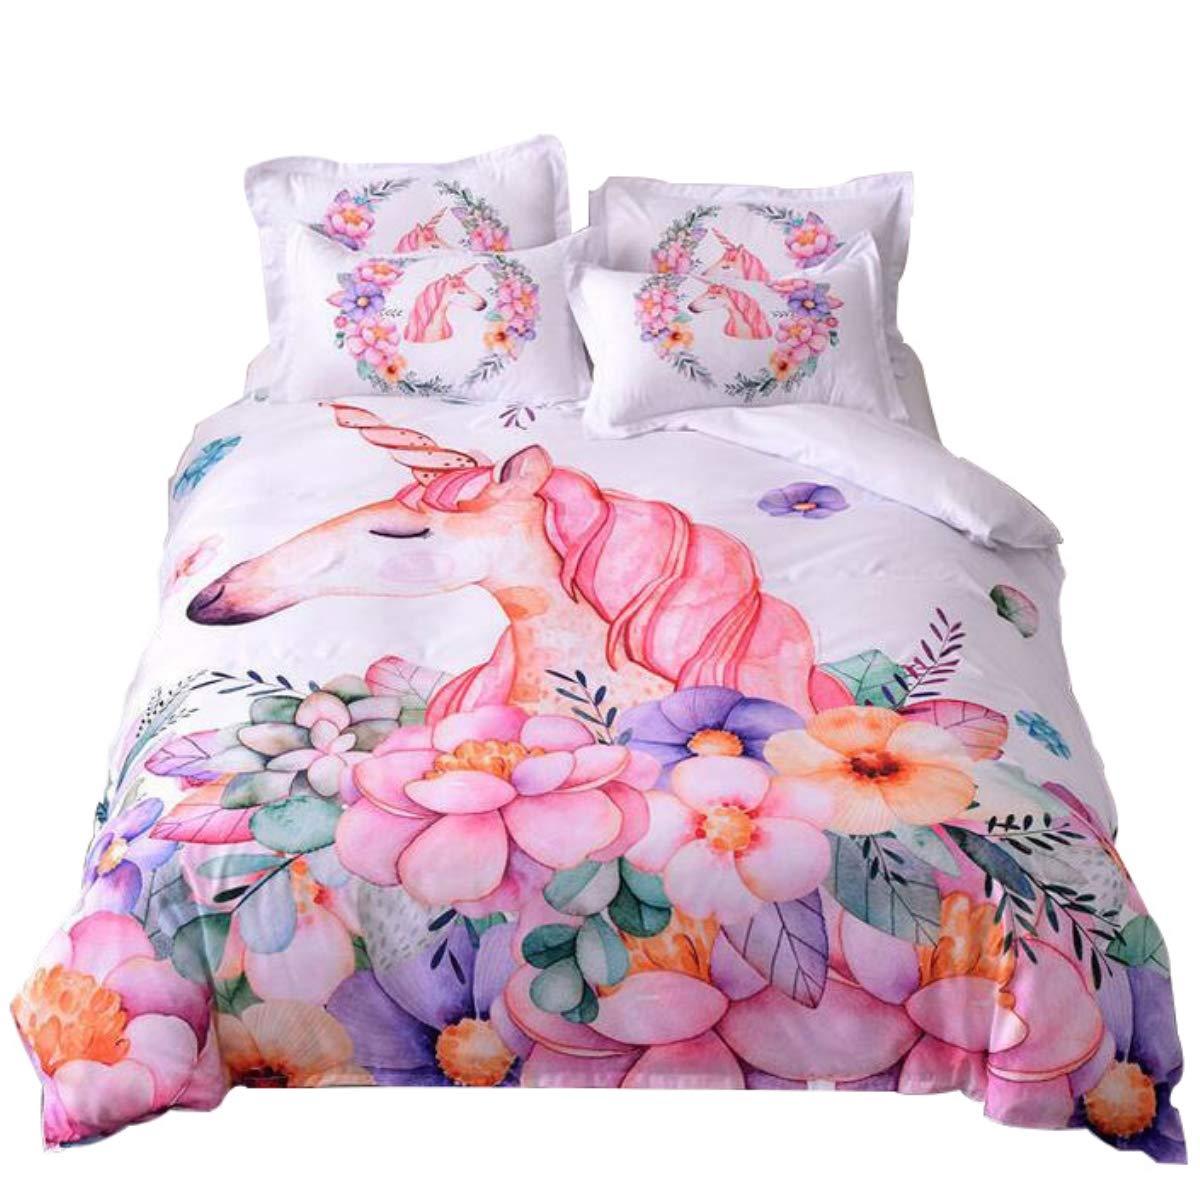 WINLIFE Pink Unicorn Print Duvet Cover Set Floral Pattern Granddaughter, Girls Gift Bedding Set Twin A